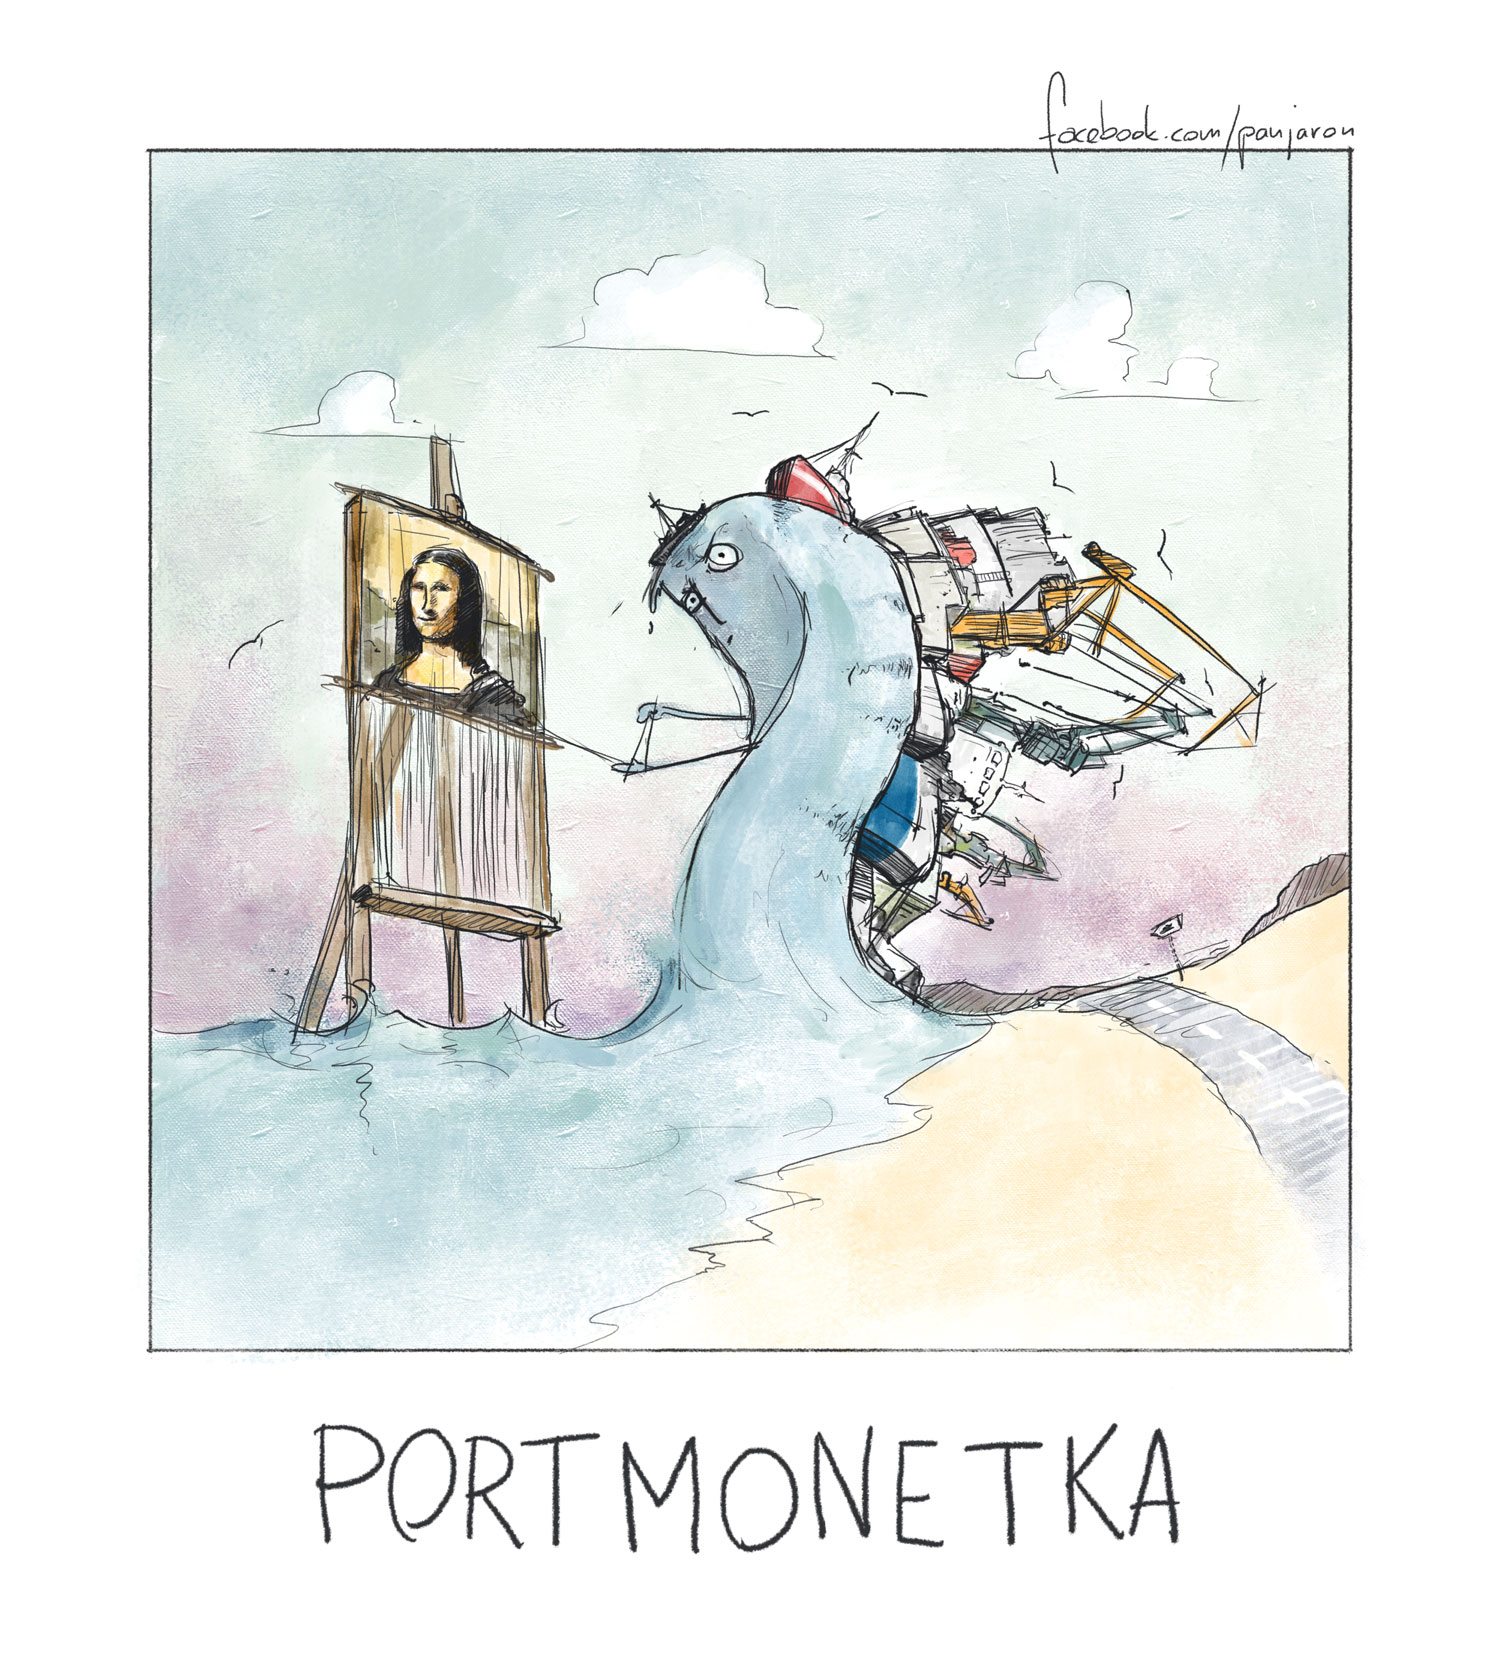 Jaroński rysownik - portmonetka